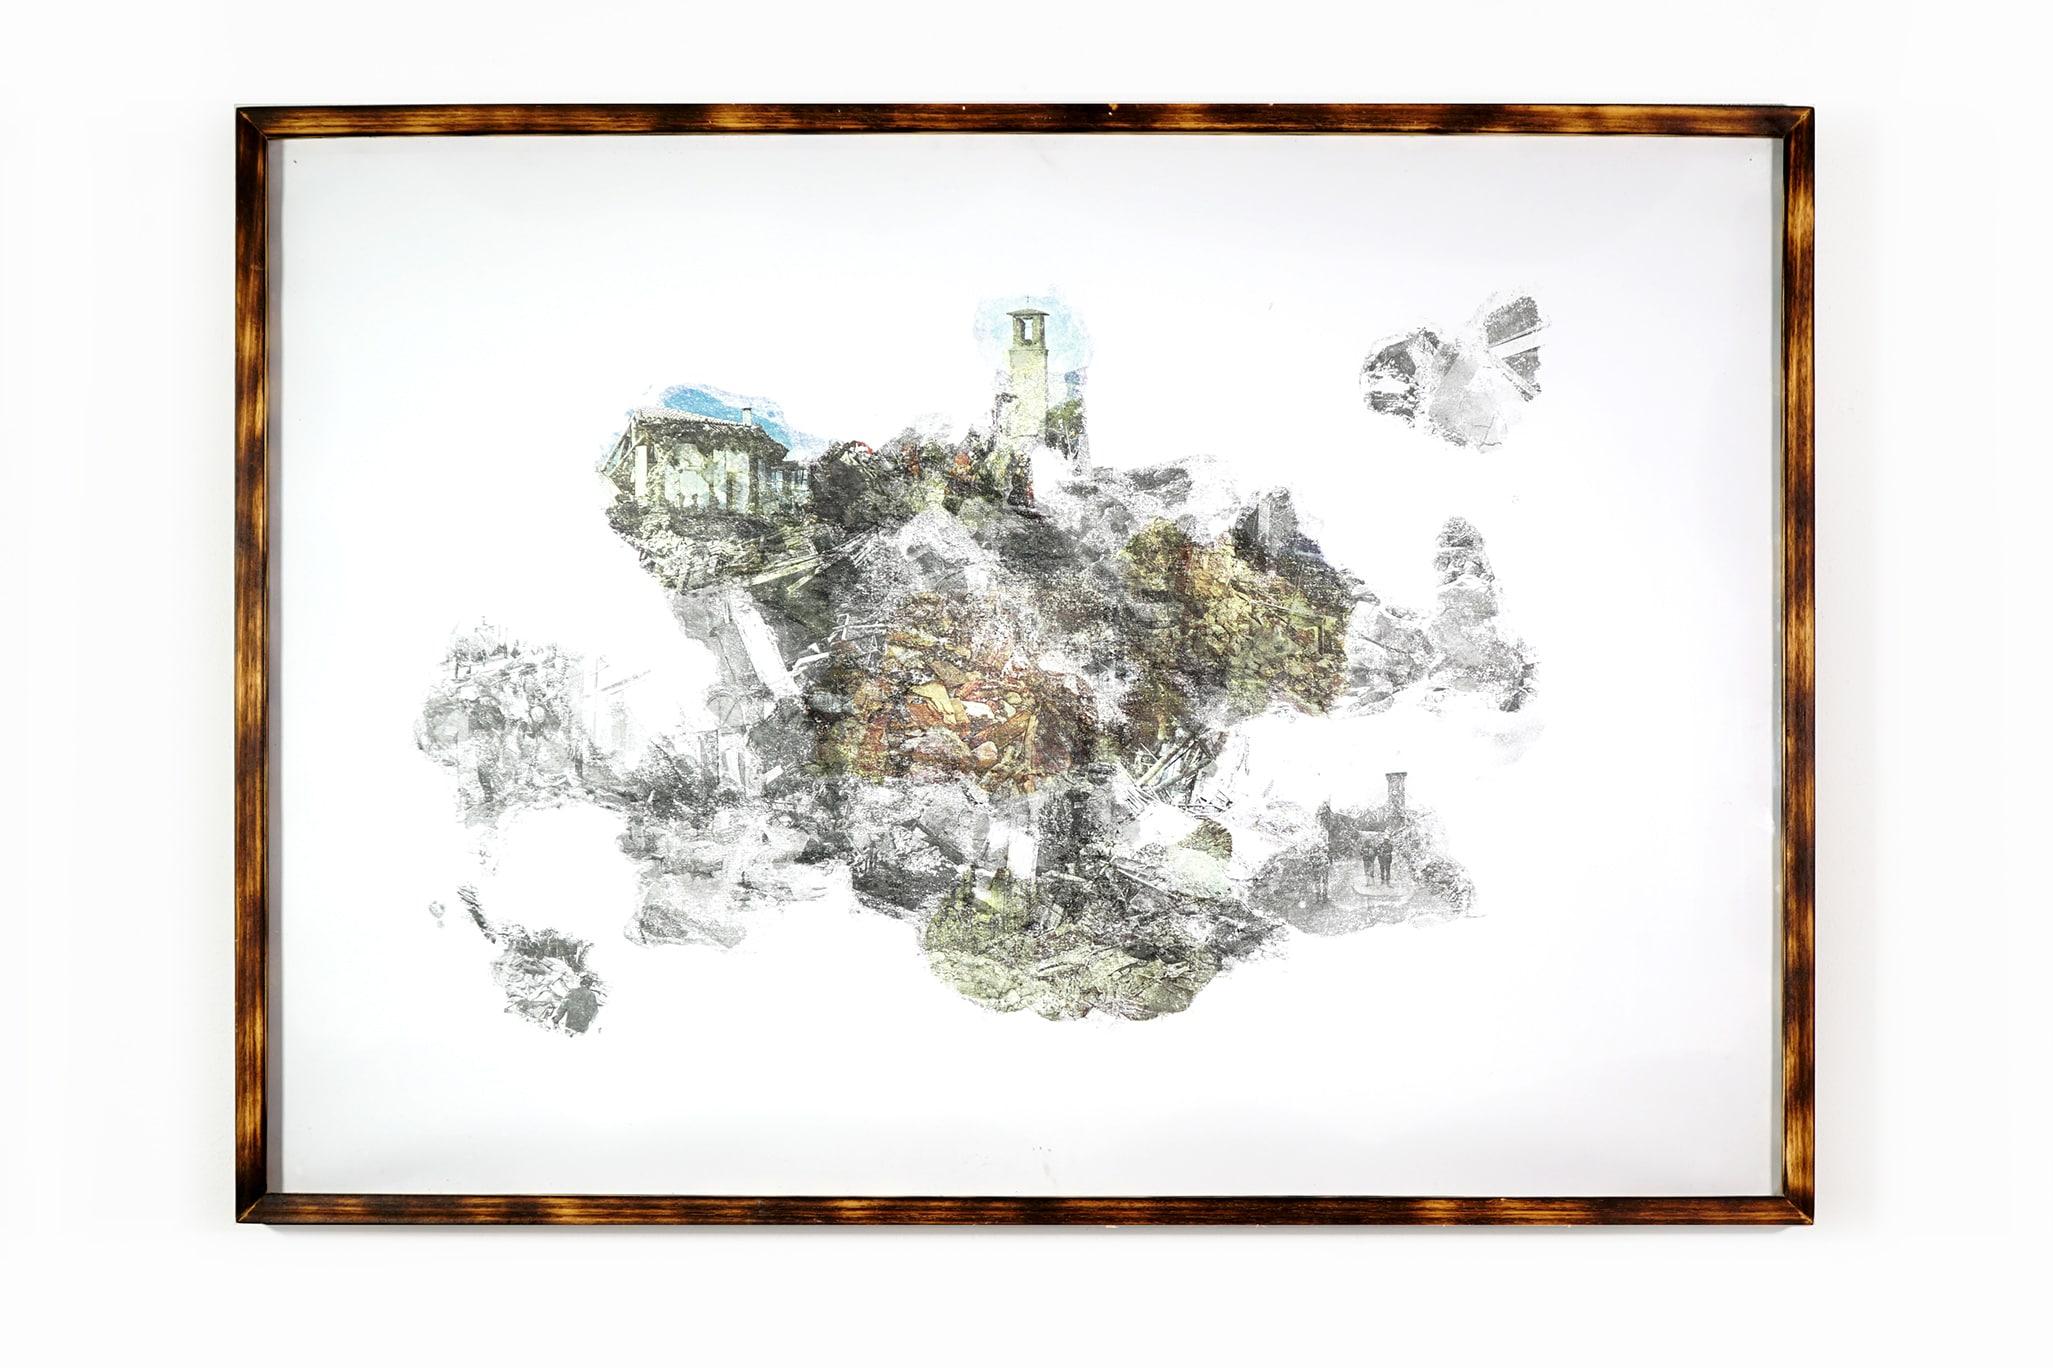 urban equalization #003 - 73x103cm with frame